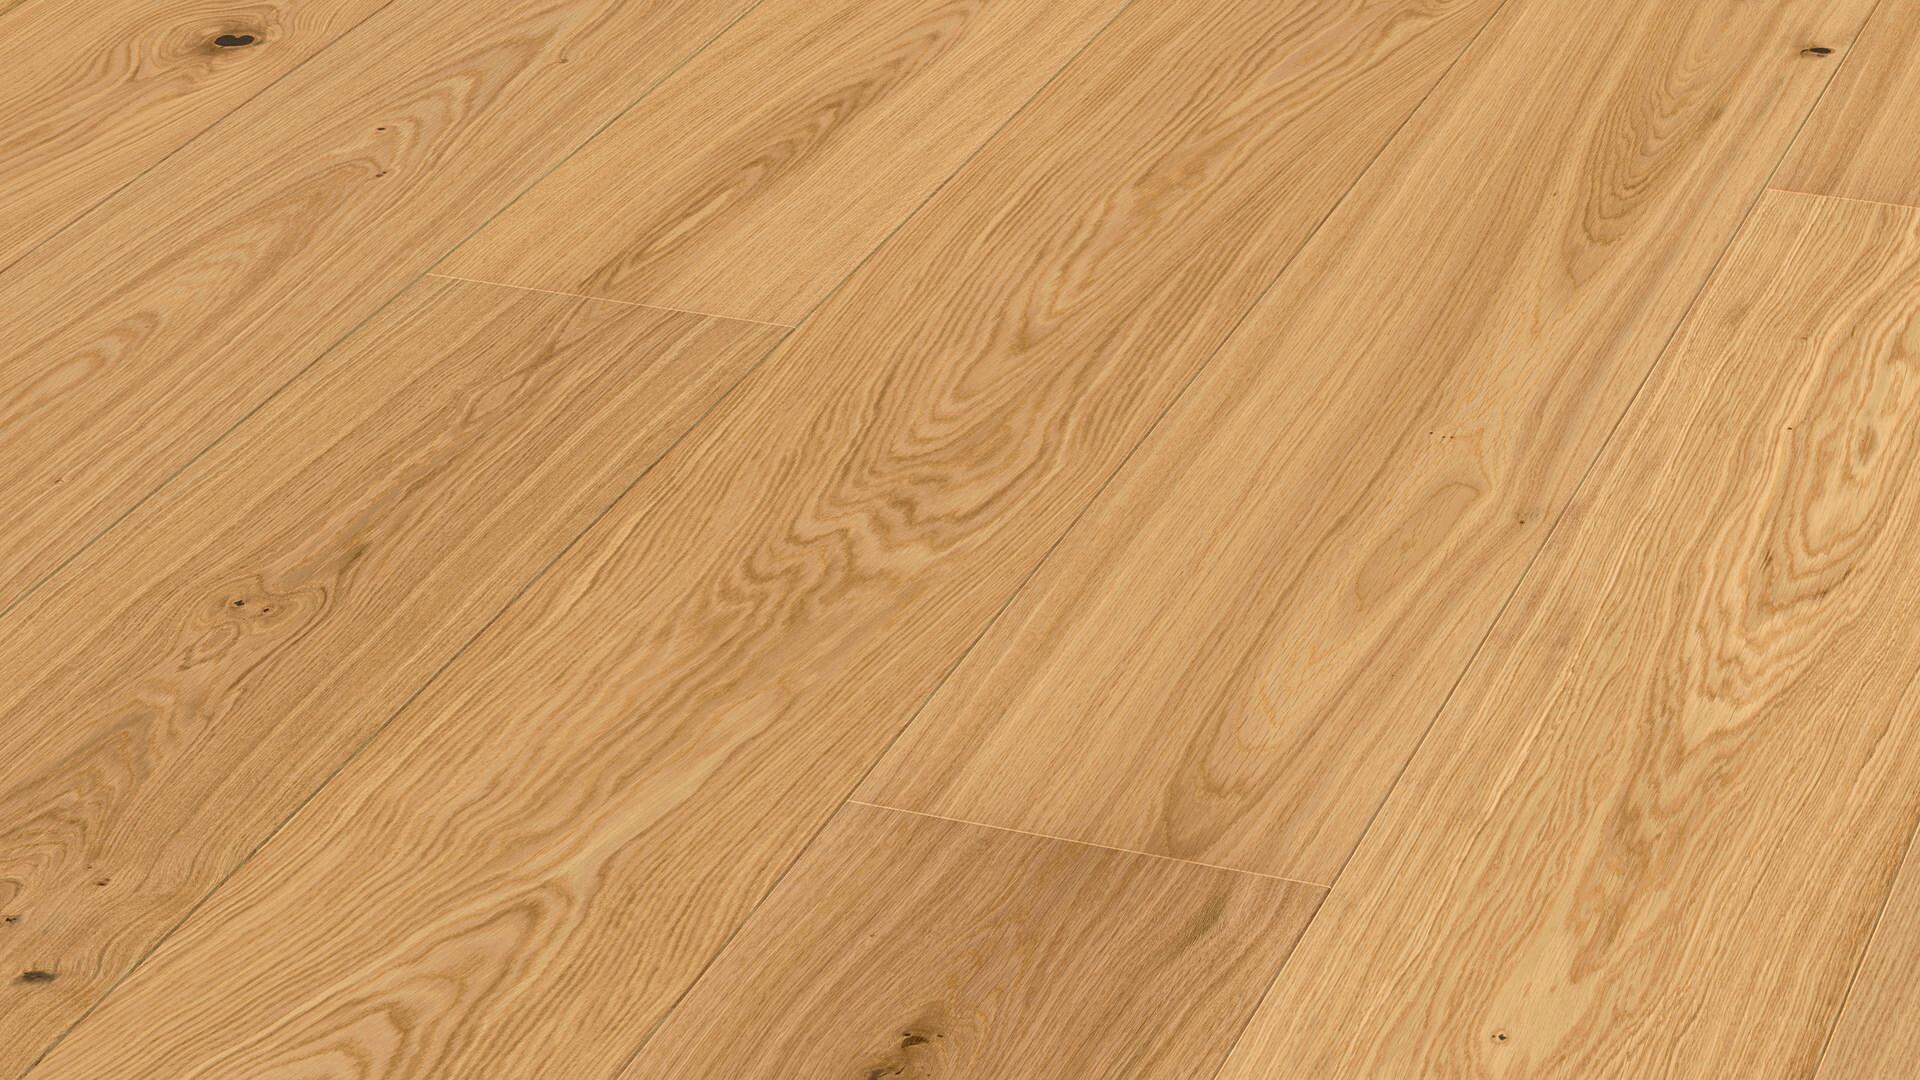 Parquet flooring MeisterParquet. longlife PD 450 Oak lively 8593